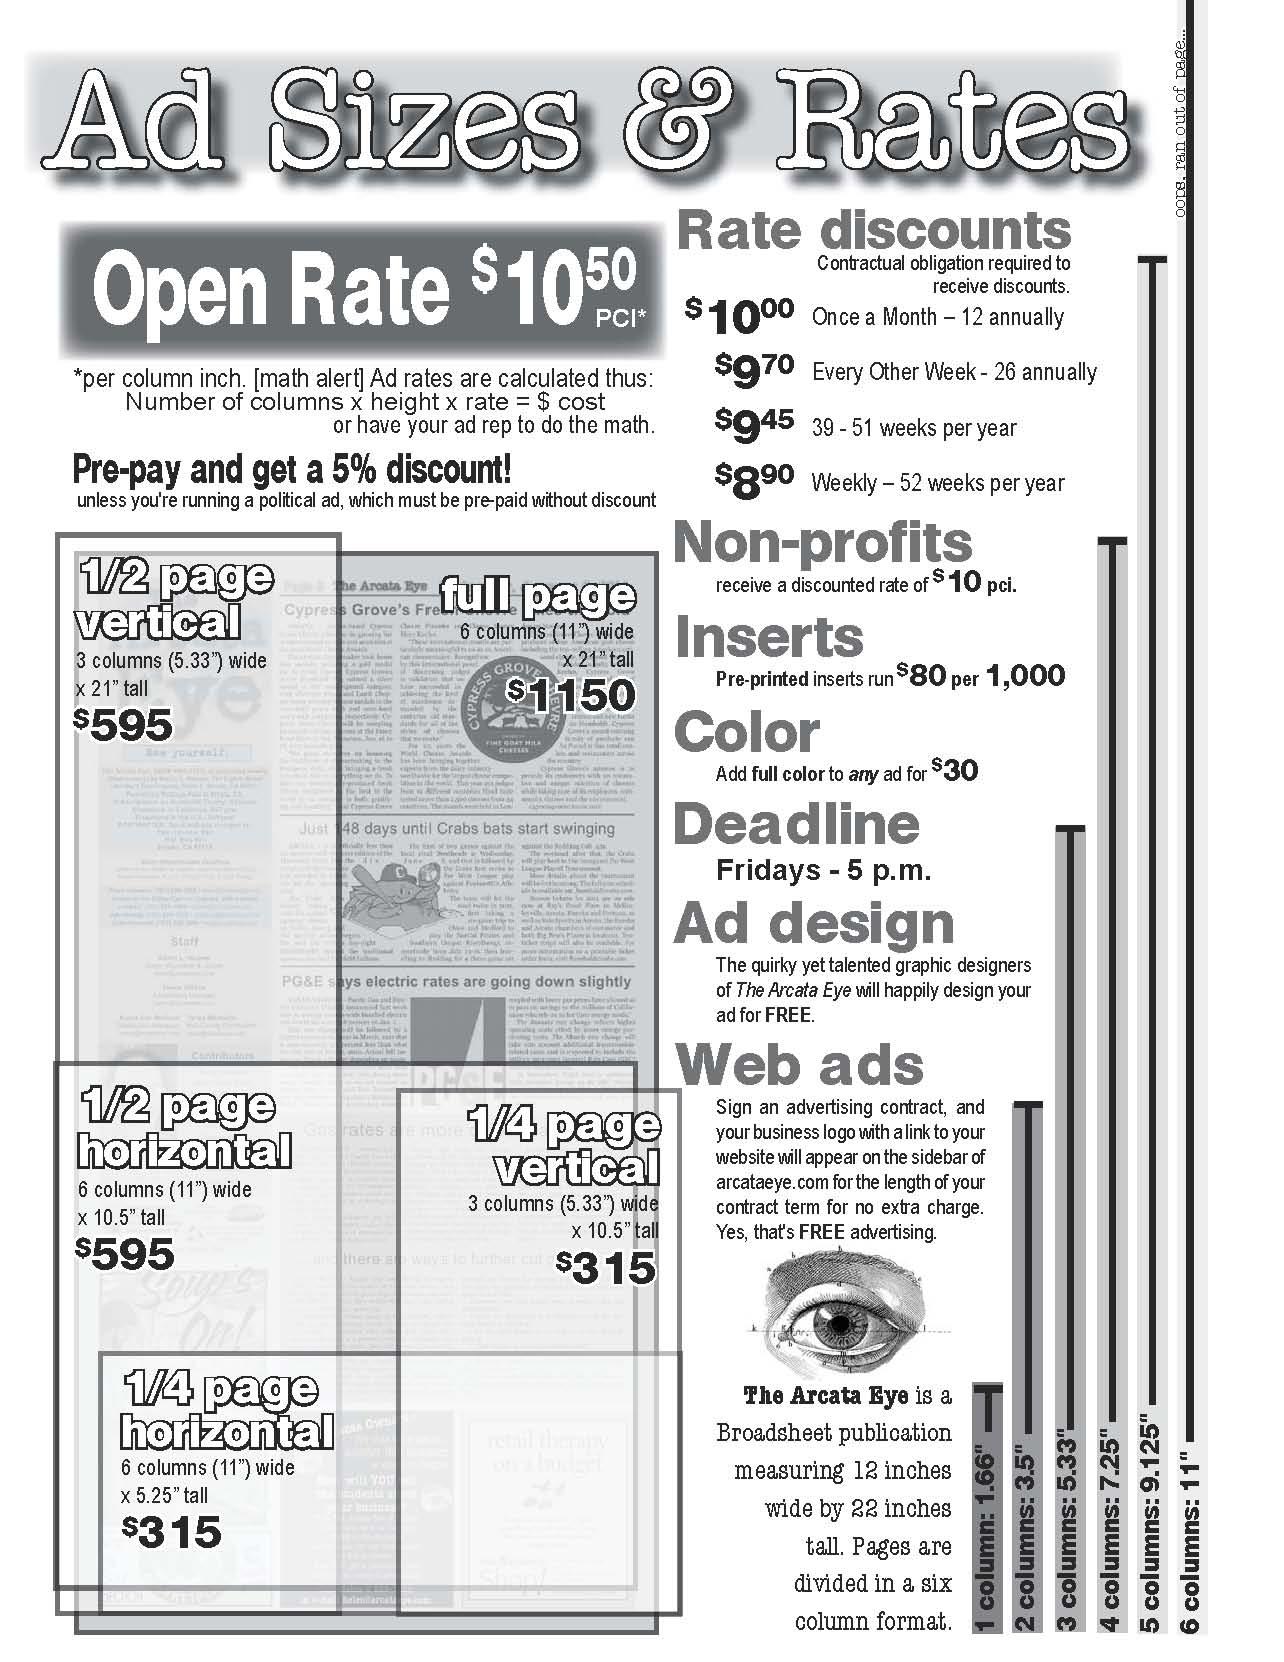 arcata-eye-rates-2011_page_2